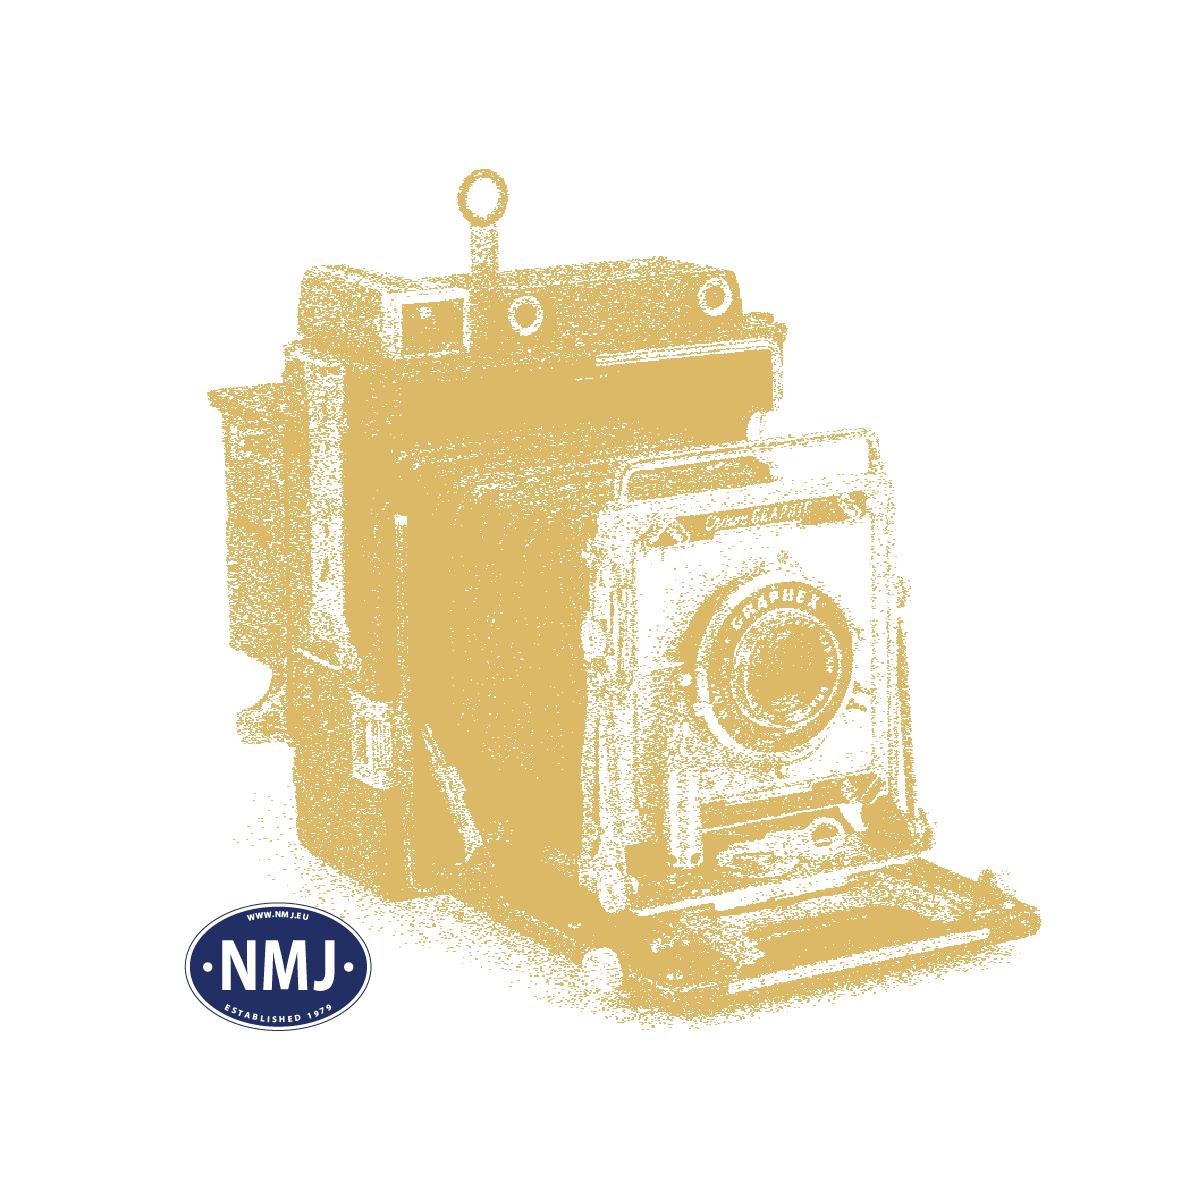 "NMJT506.204 - NMJ Topline NSB Gbs 150 0 071-8 ""Glava"""